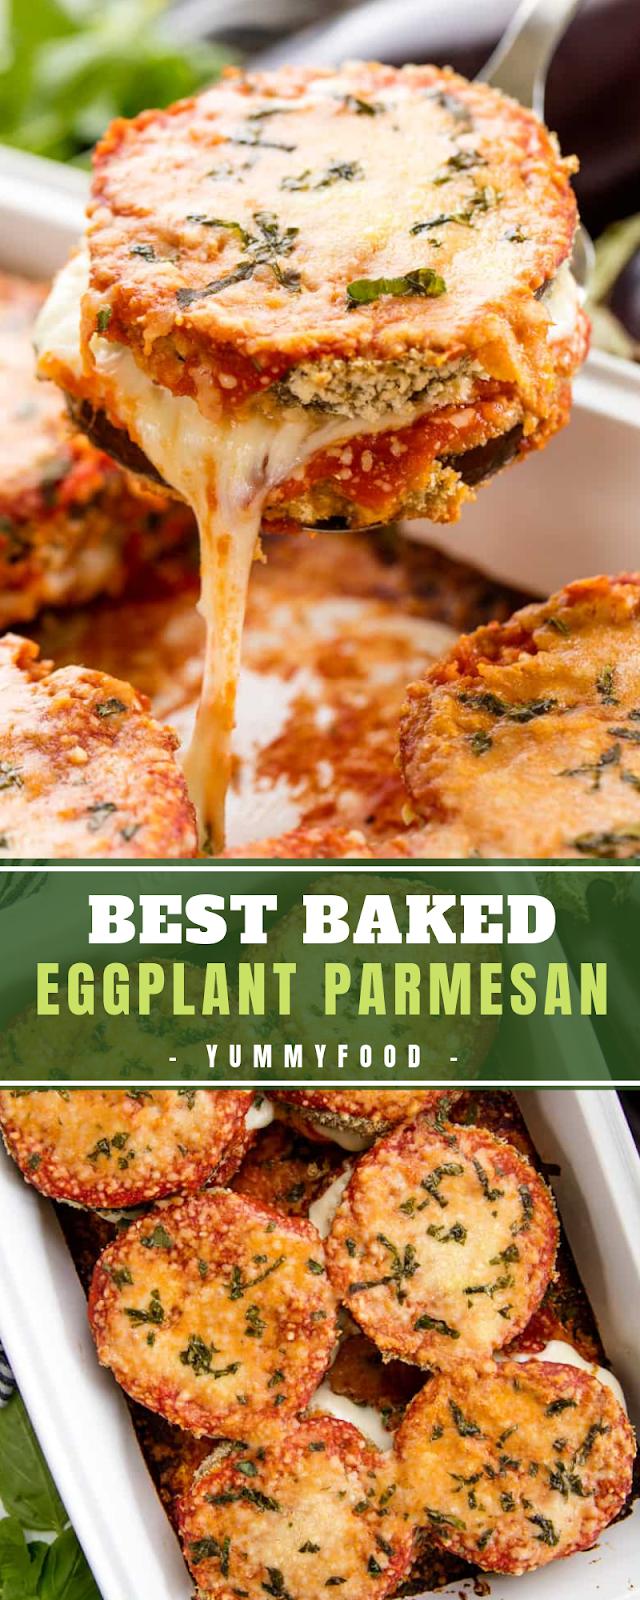 Bеѕt Baked Eggplant Pаrmеѕаn